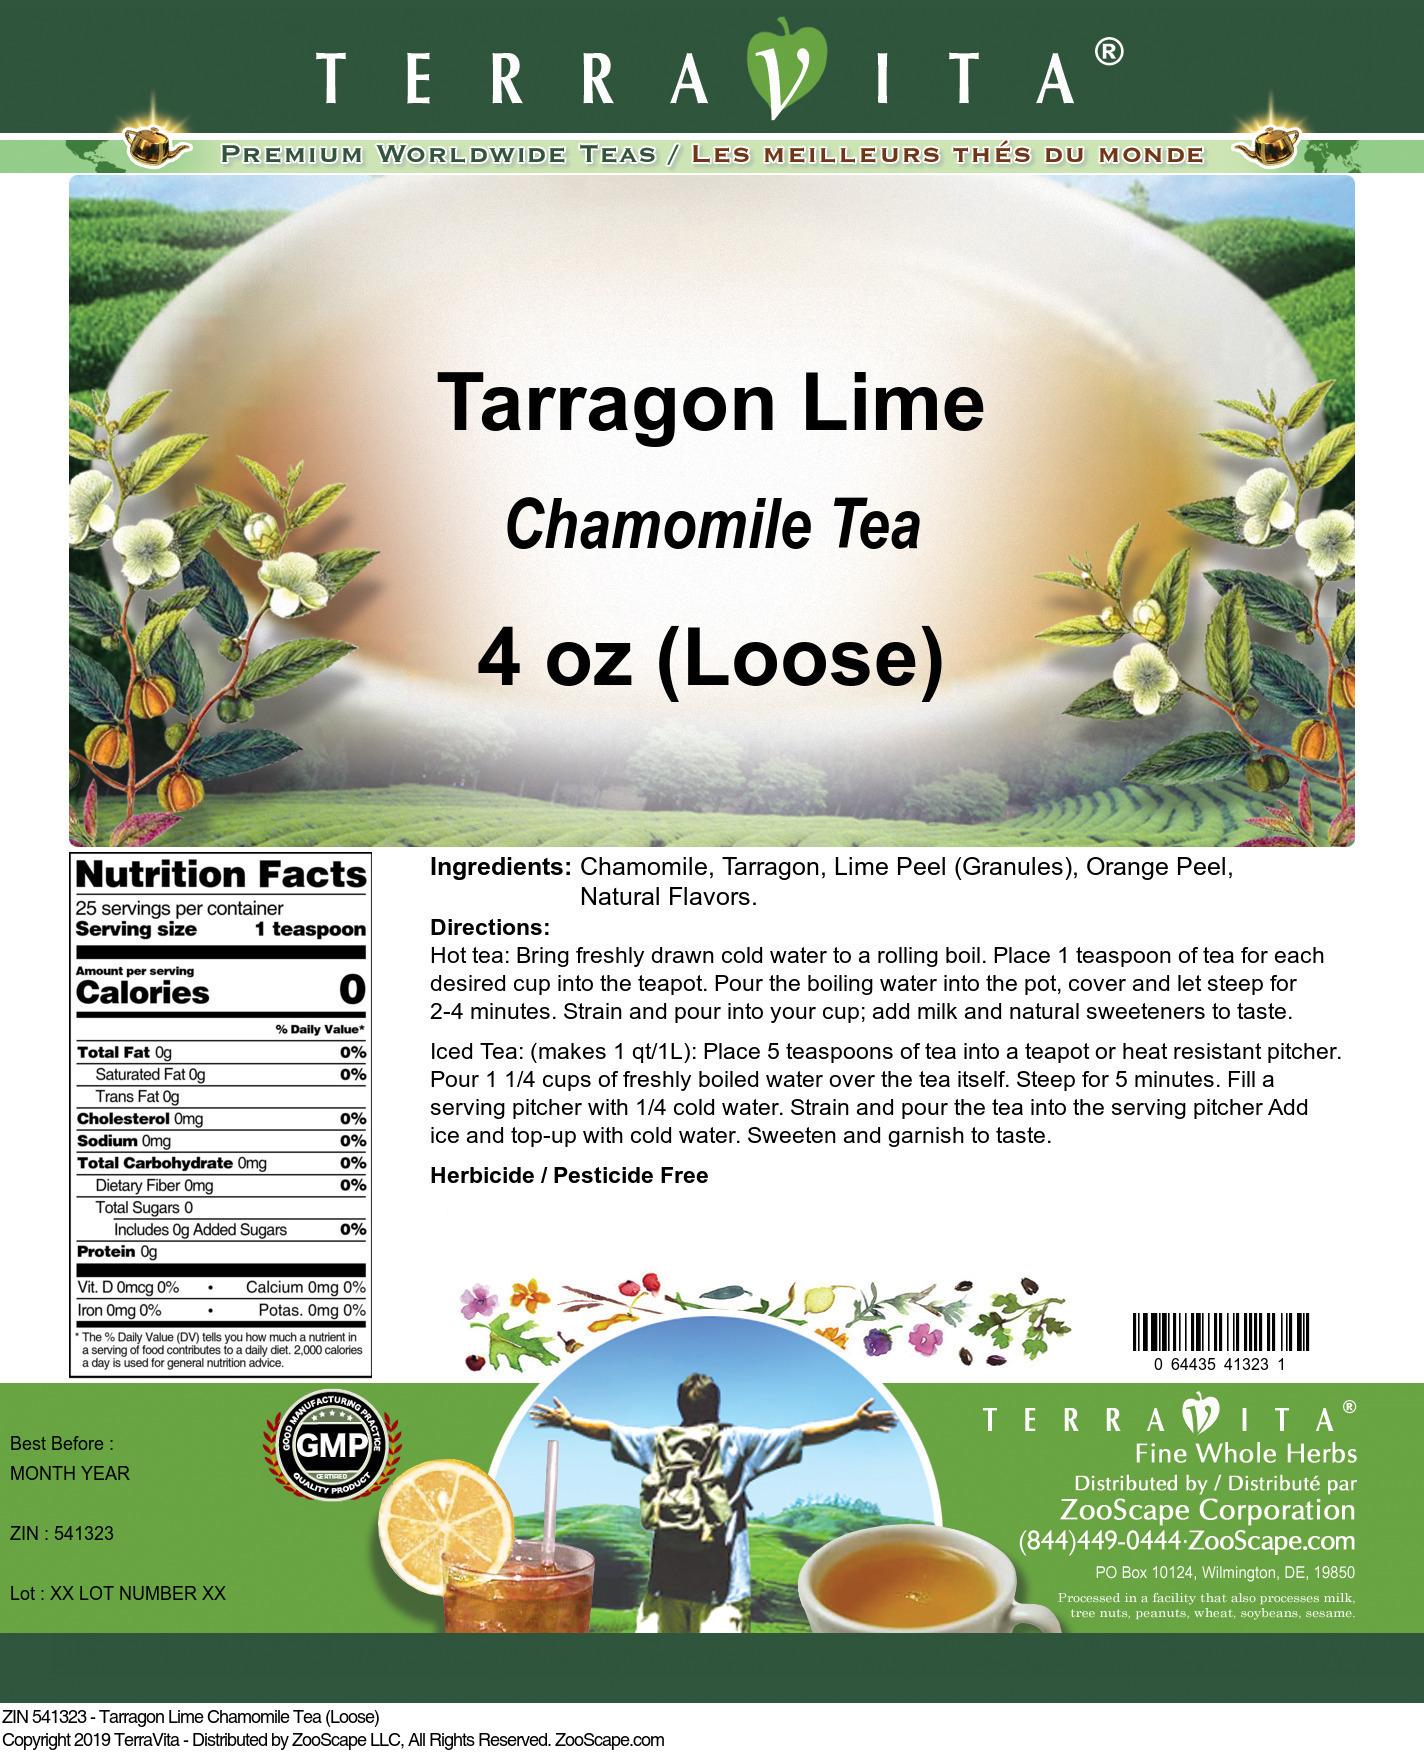 Tarragon Lime Chamomile Tea